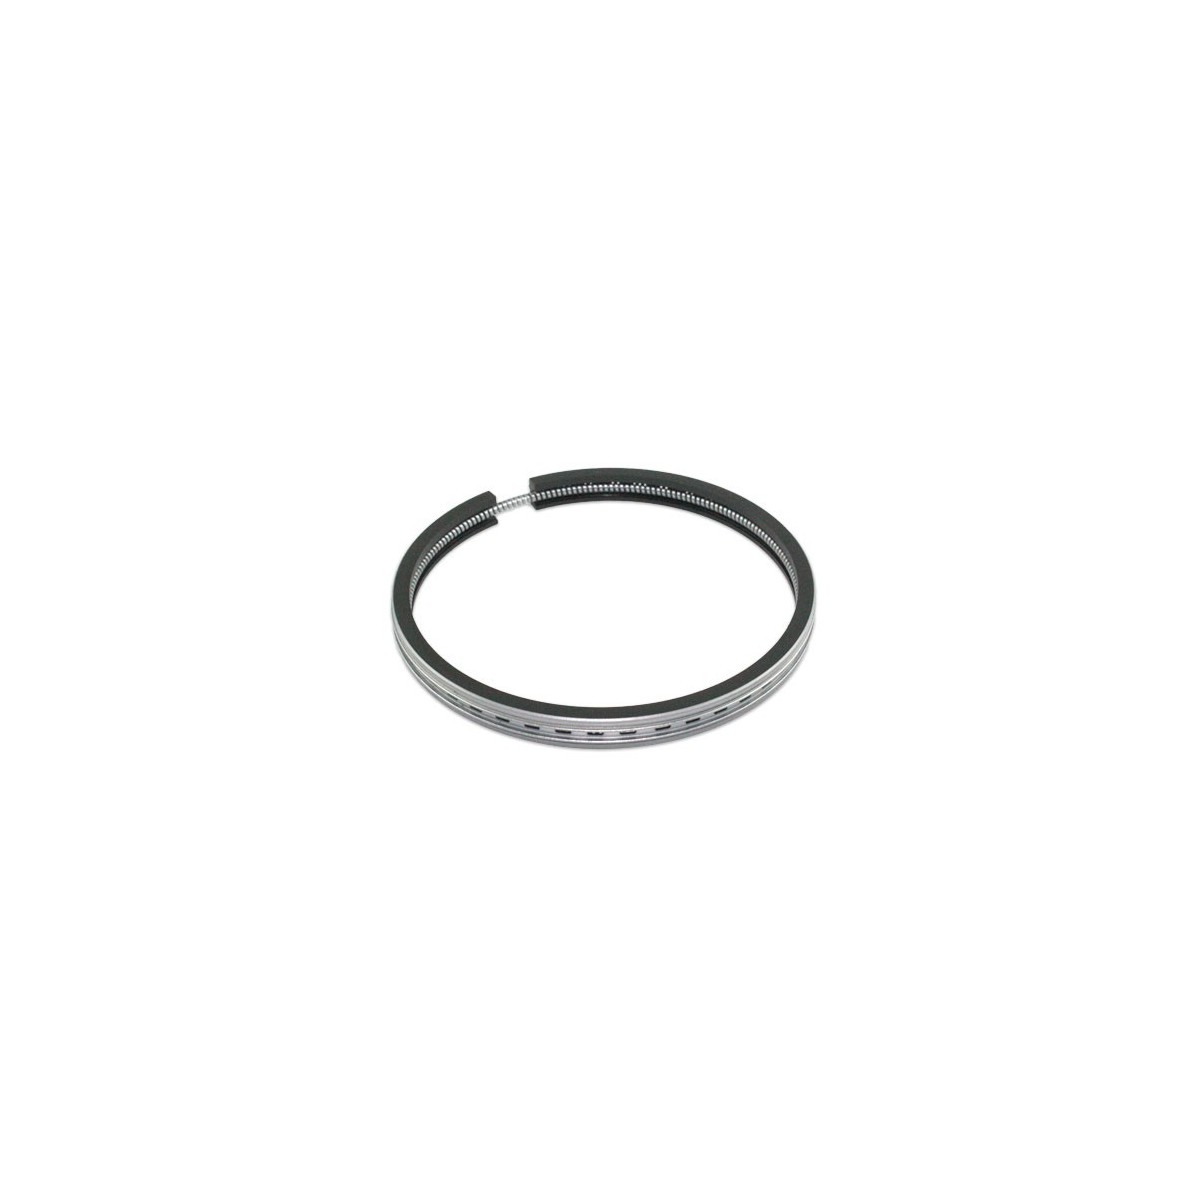 Piston Ring Set Yanmar FX20 82: 2 x  2  x 4  STD